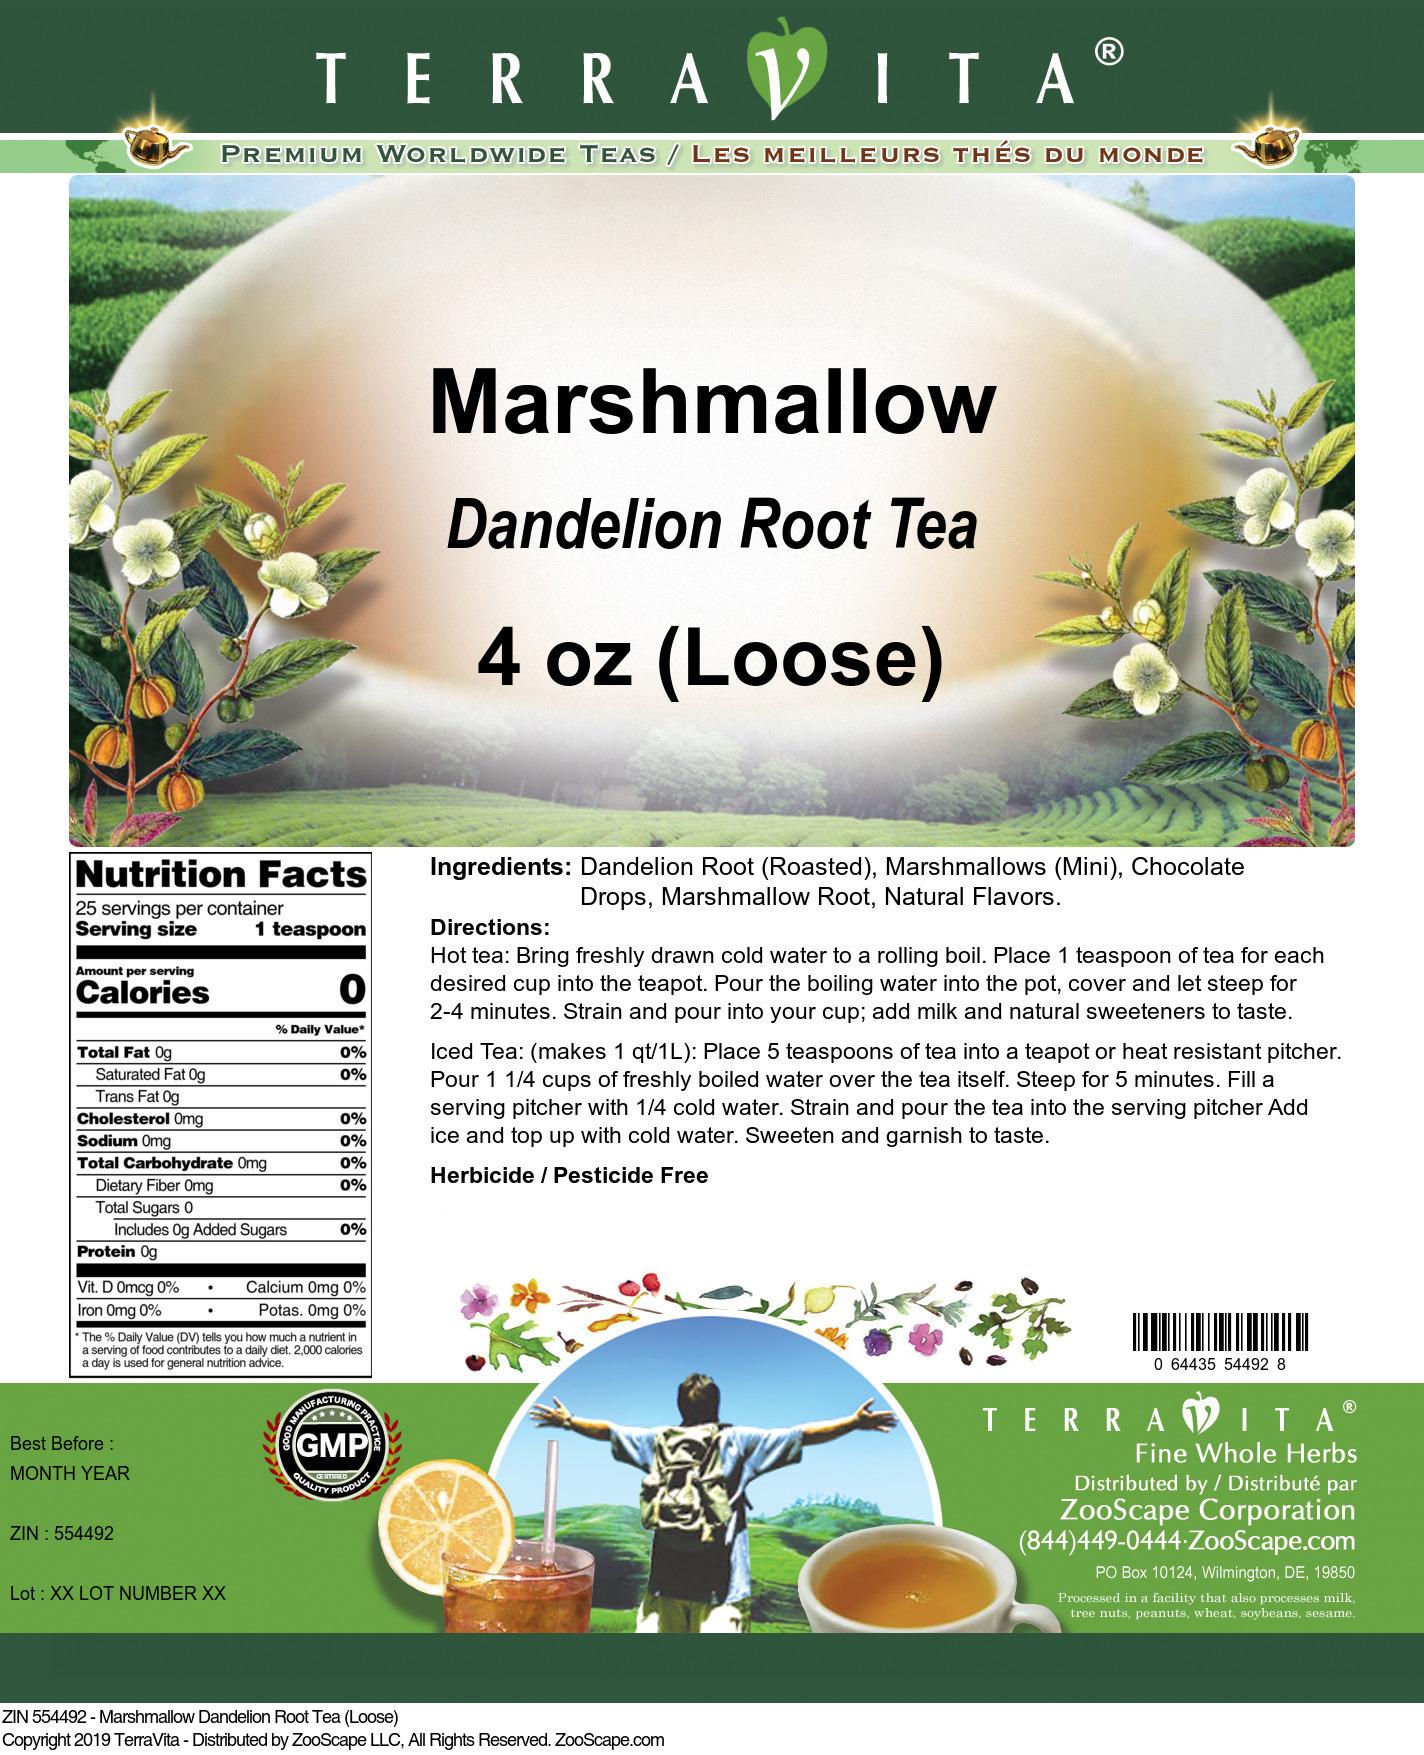 Marshmallow Dandelion Root